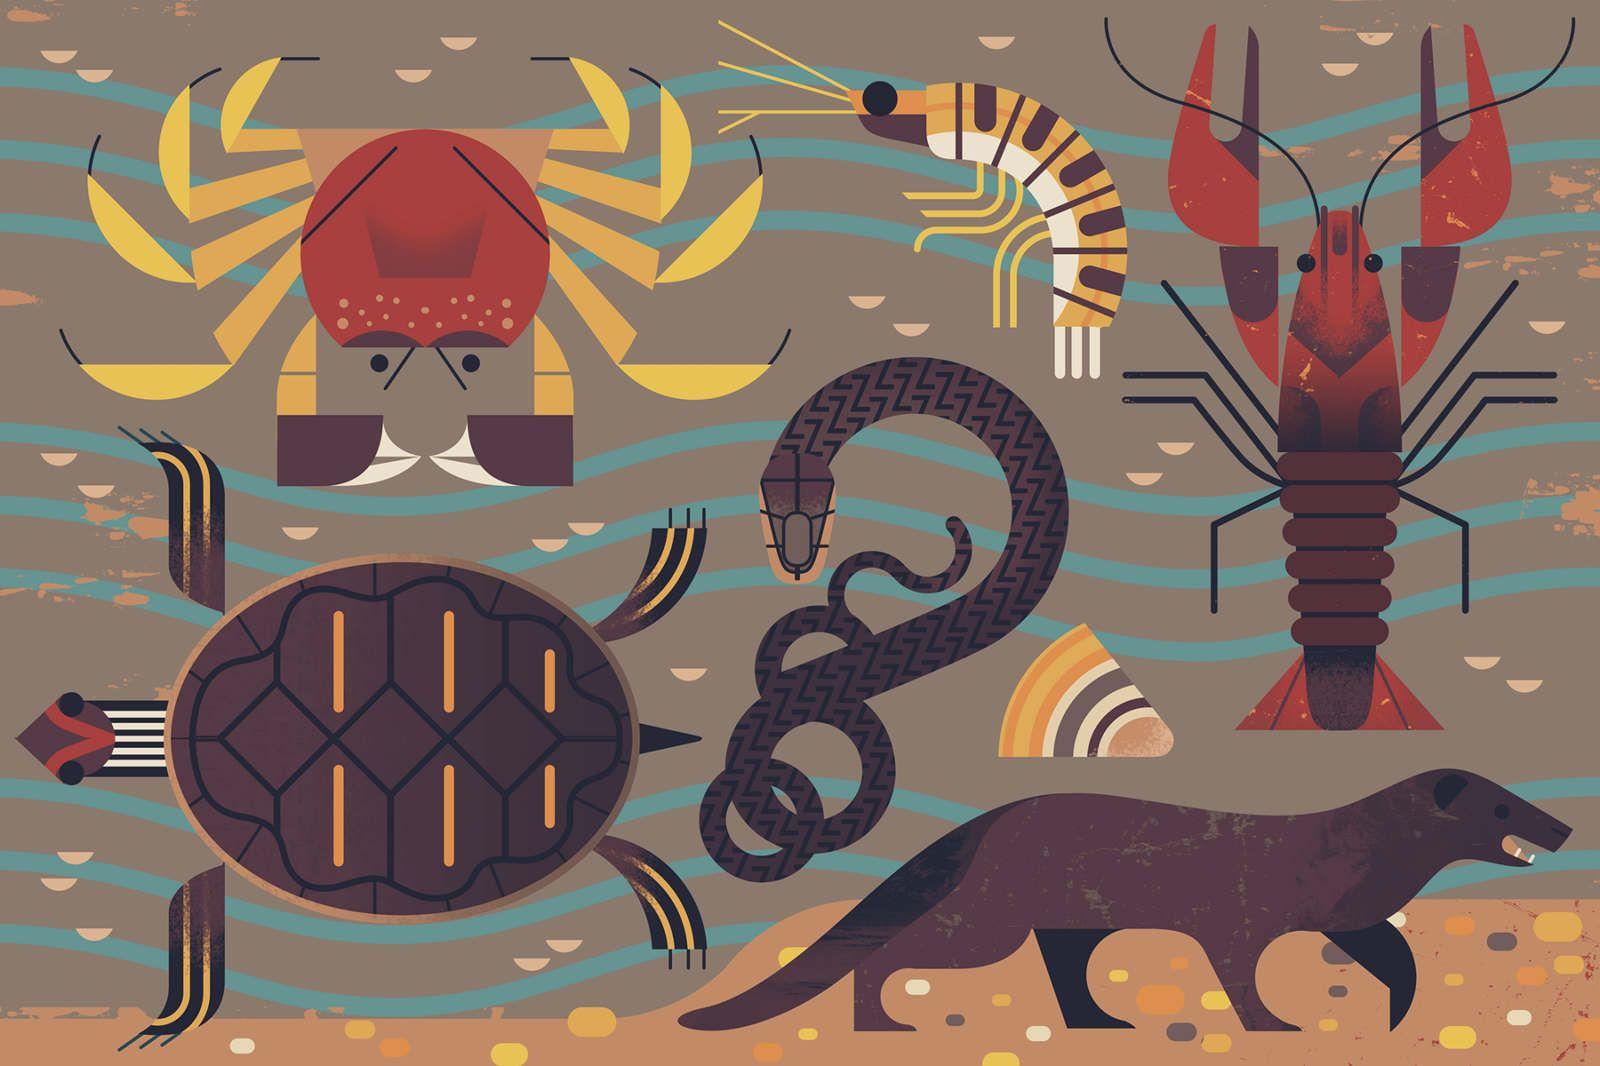 Canal & River Trust - Owen Davey Illustration